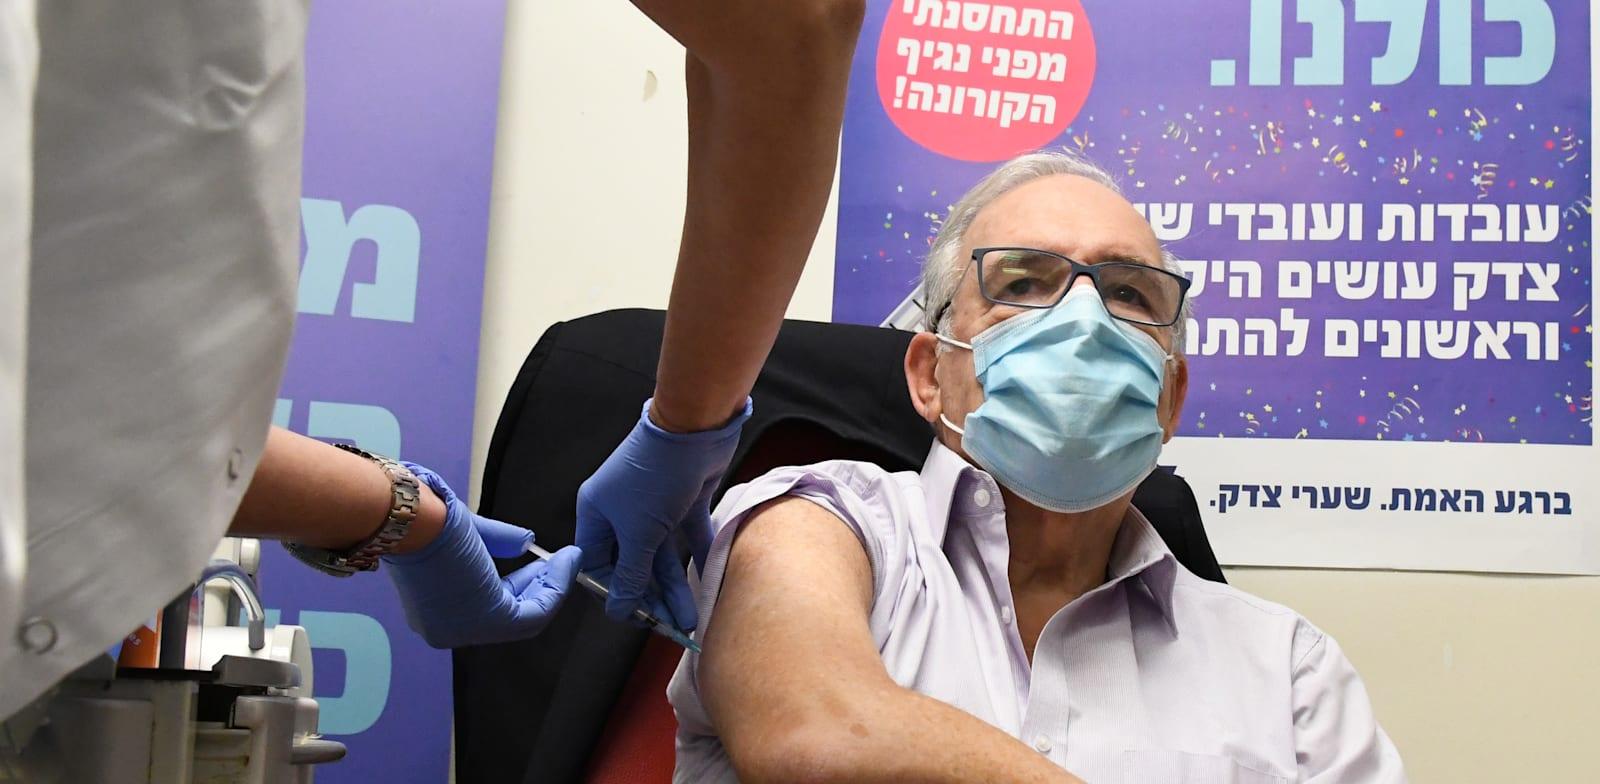 Vaccination at Shaarei Zedek Credit: Rafi Kotz